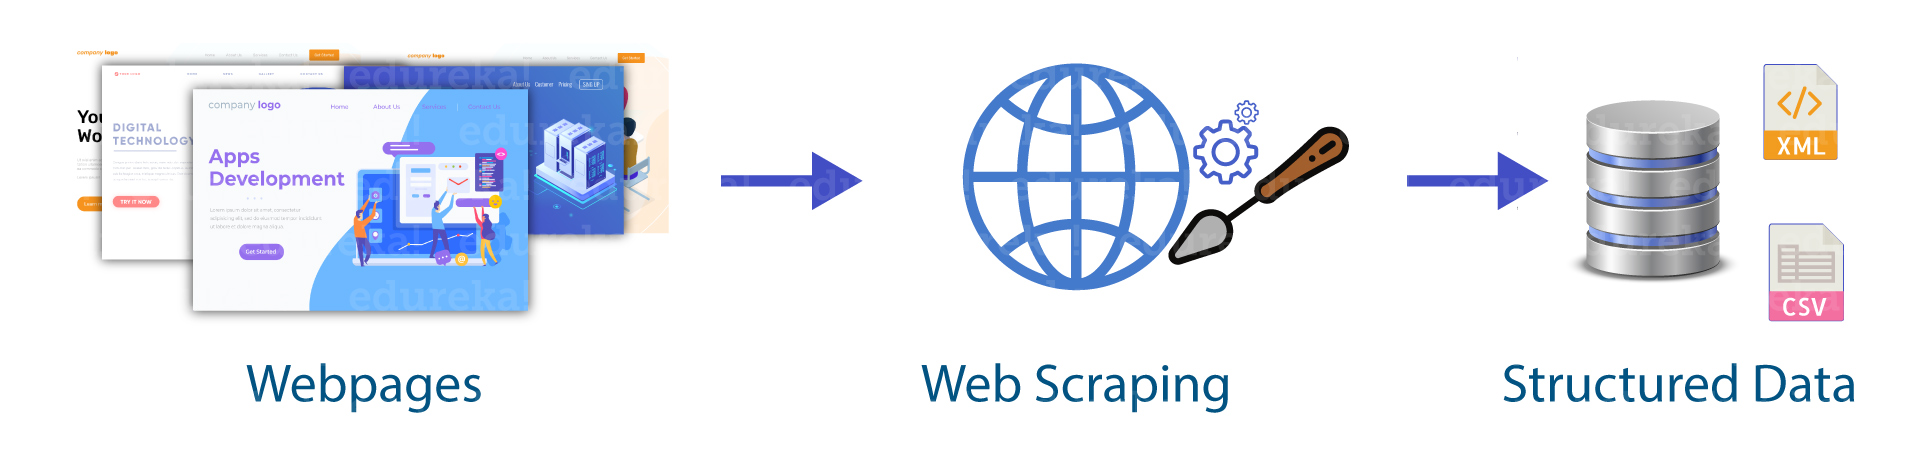 AutoScraper Library web scraper